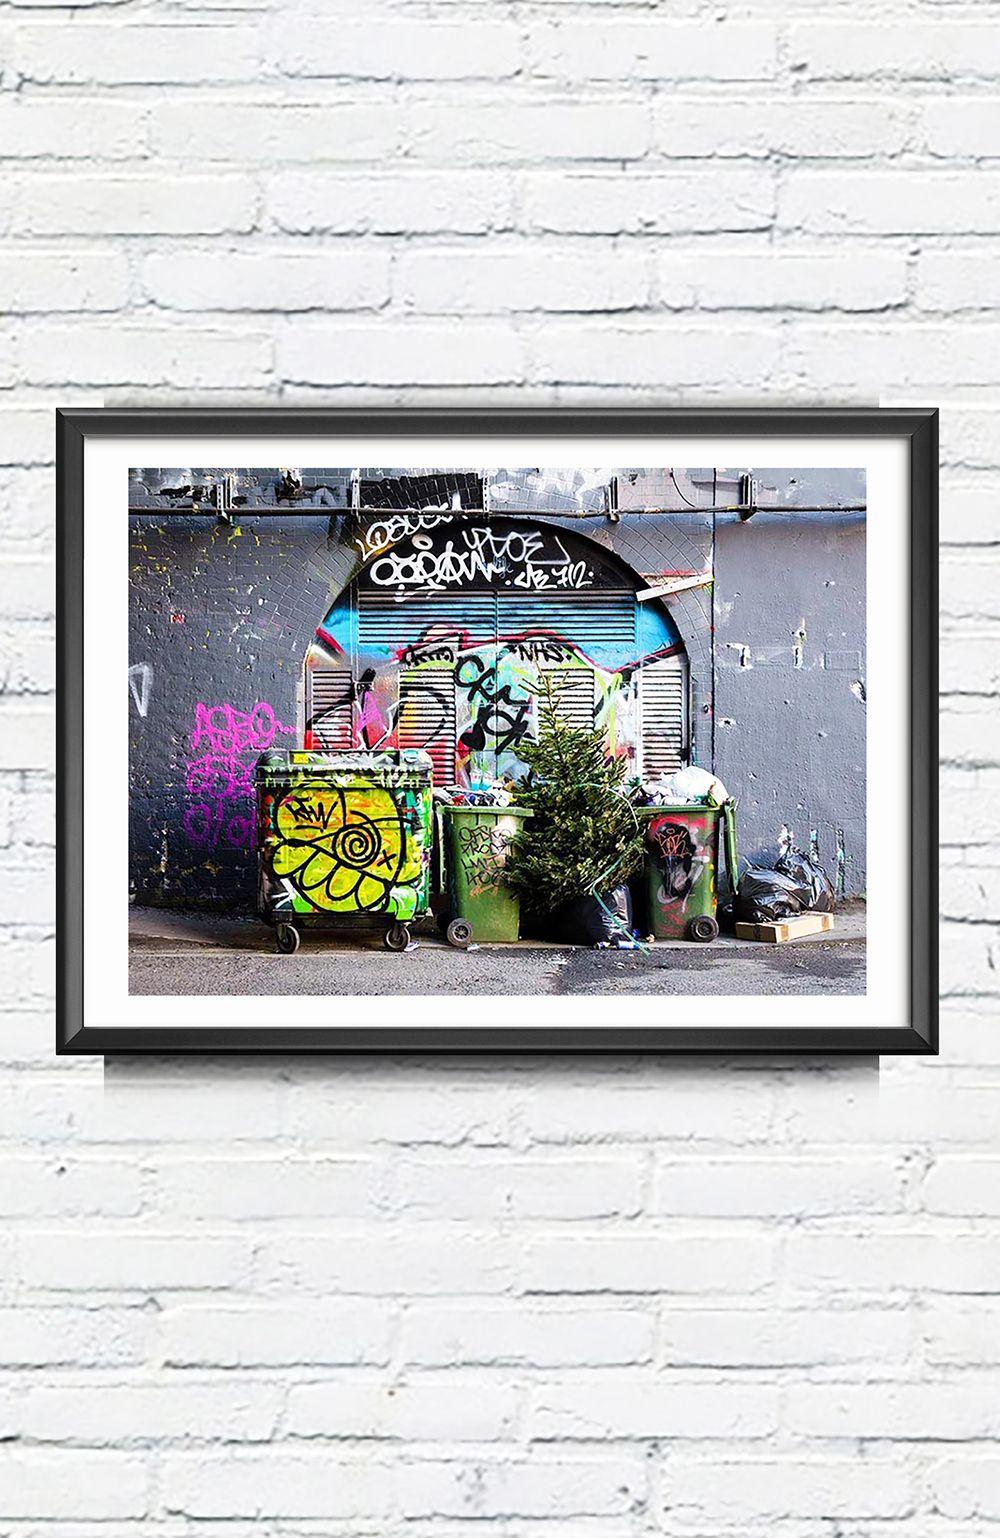 Christmas Graffiti Background.Framed Urban Print A3 Graffiti Photo Still Life Street